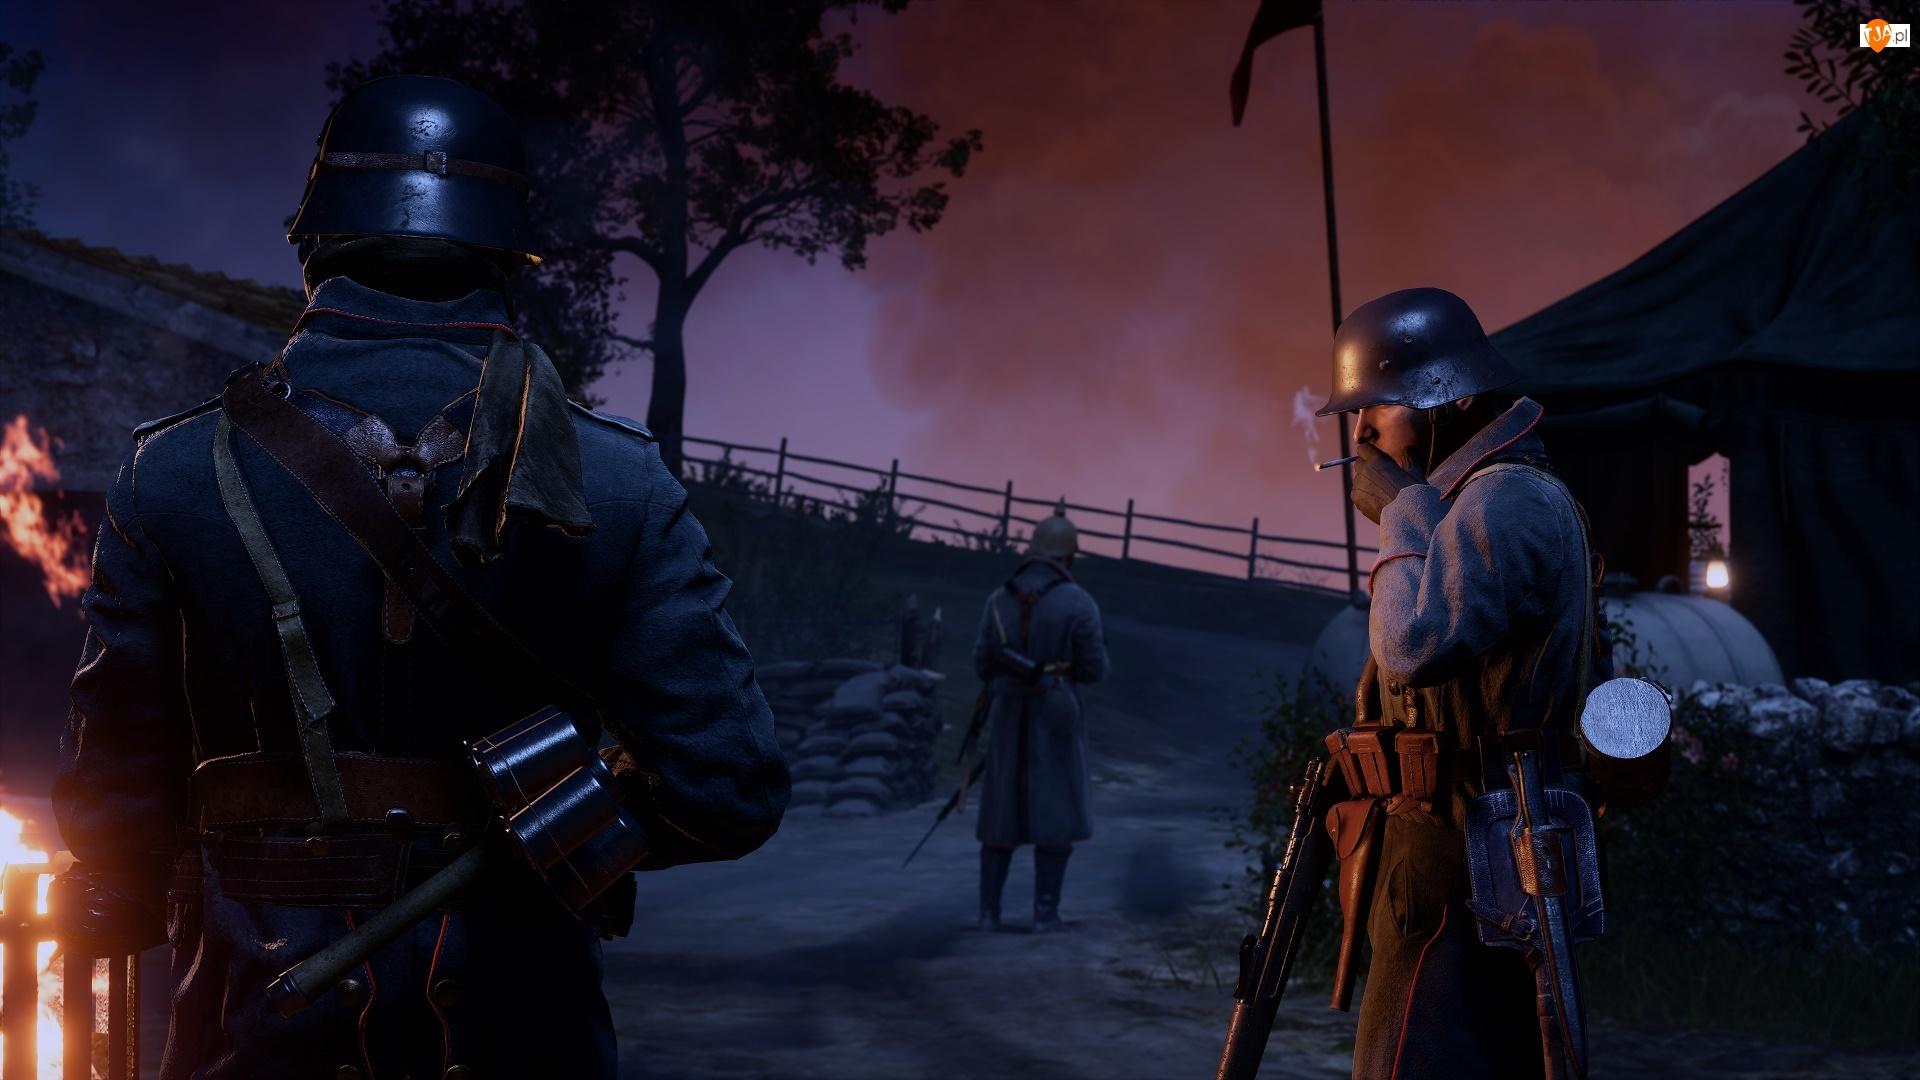 Gra, Warta, Battlefield, Żołnierze